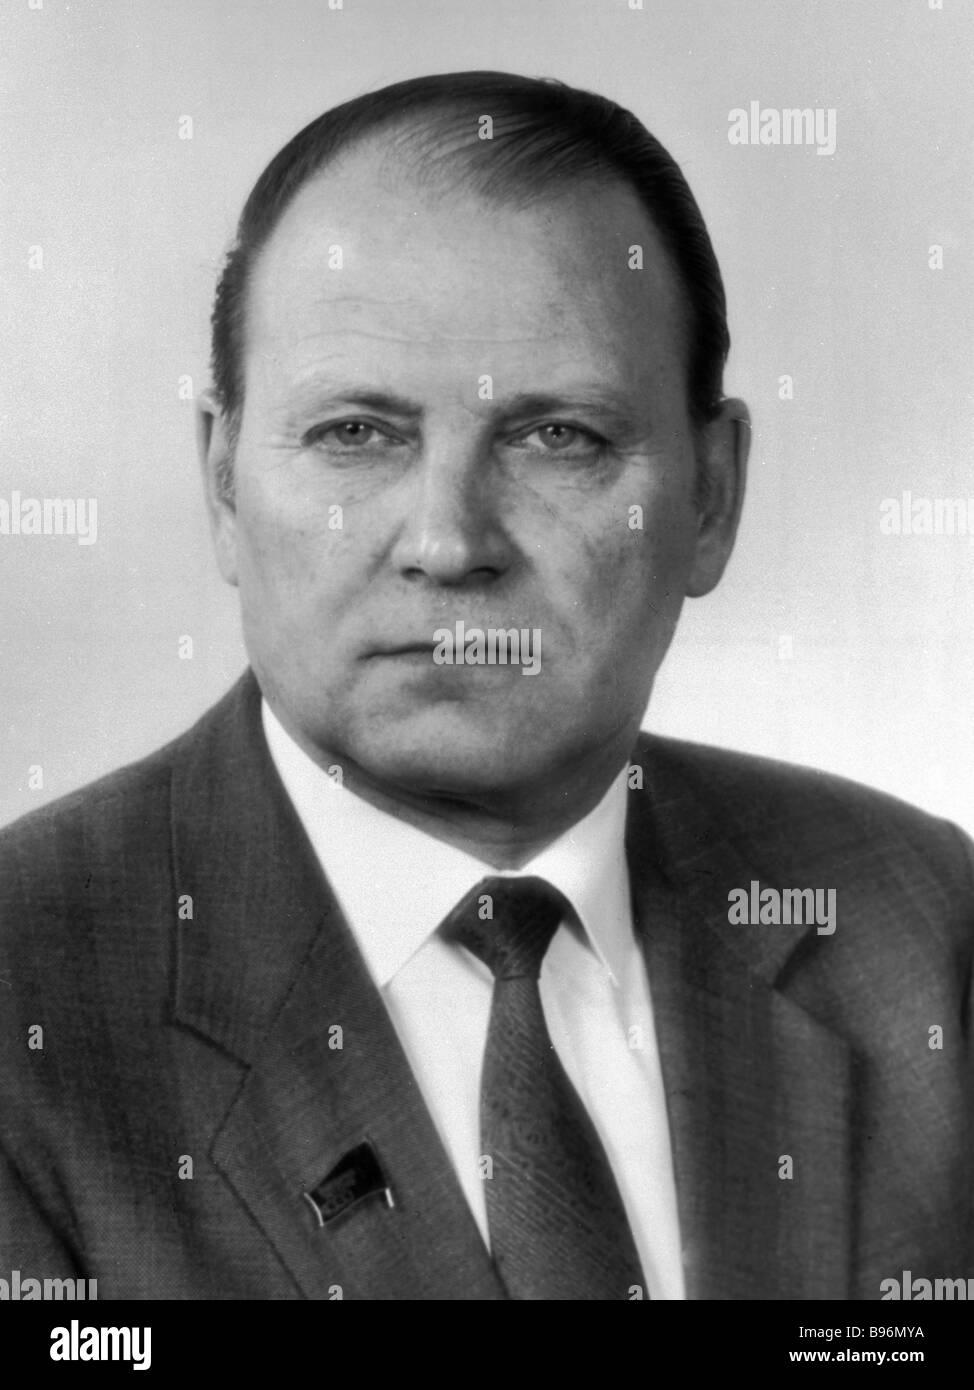 Oleg Shenin member of the Politburo of the CPSU CC and Secretary of the CPSU CC Stock Photo